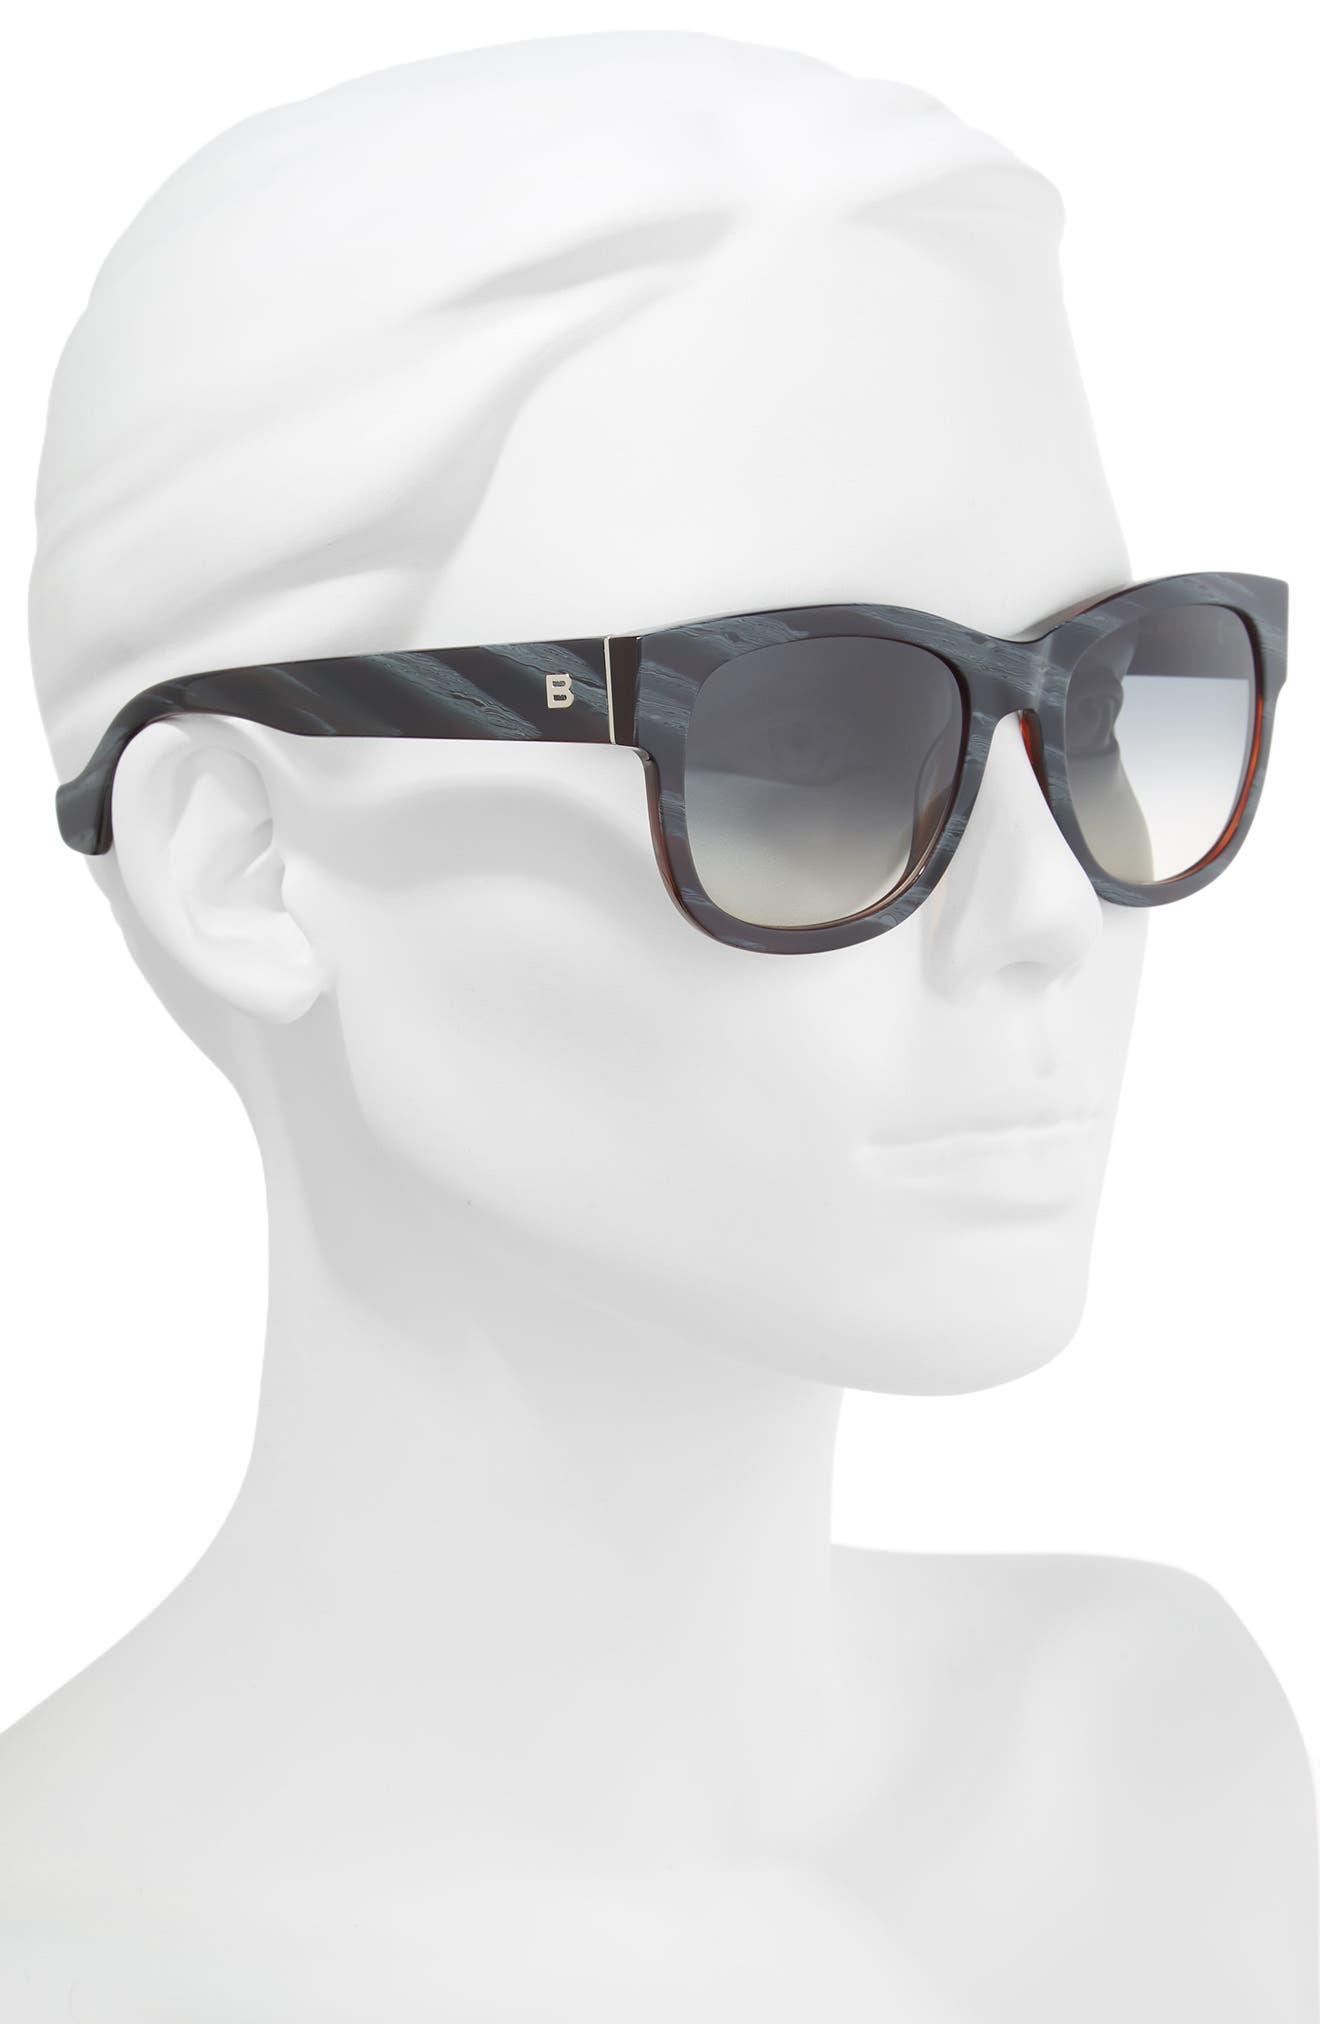 54mm Retro Sunglasses,                             Alternate thumbnail 2, color,                             400